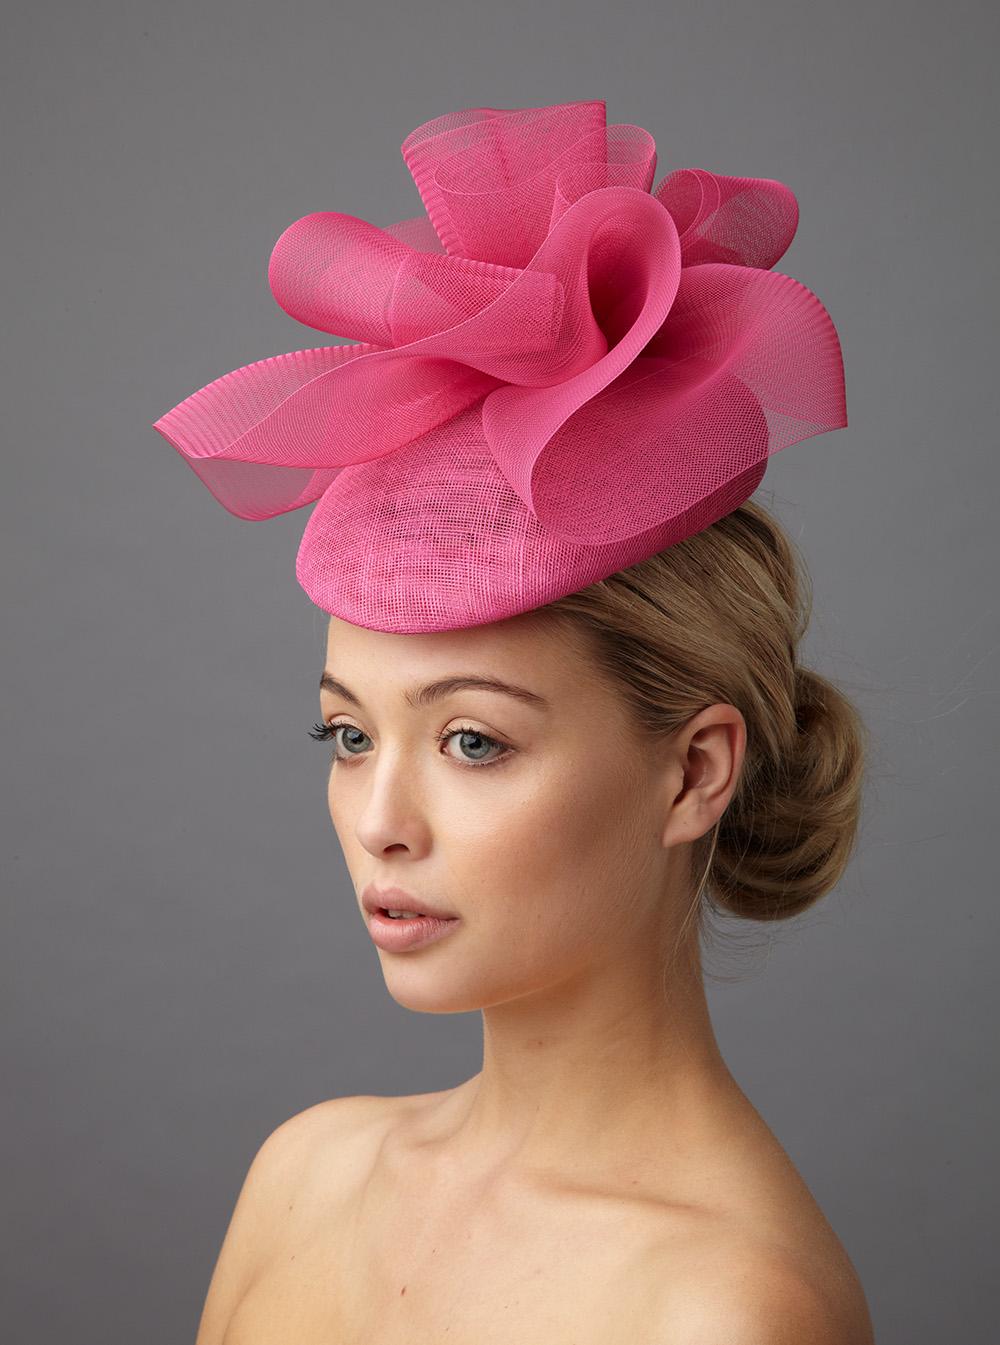 5b9762d5 Bacall Pillbox Hat. Bacall pillbox hat by Hostie Hats